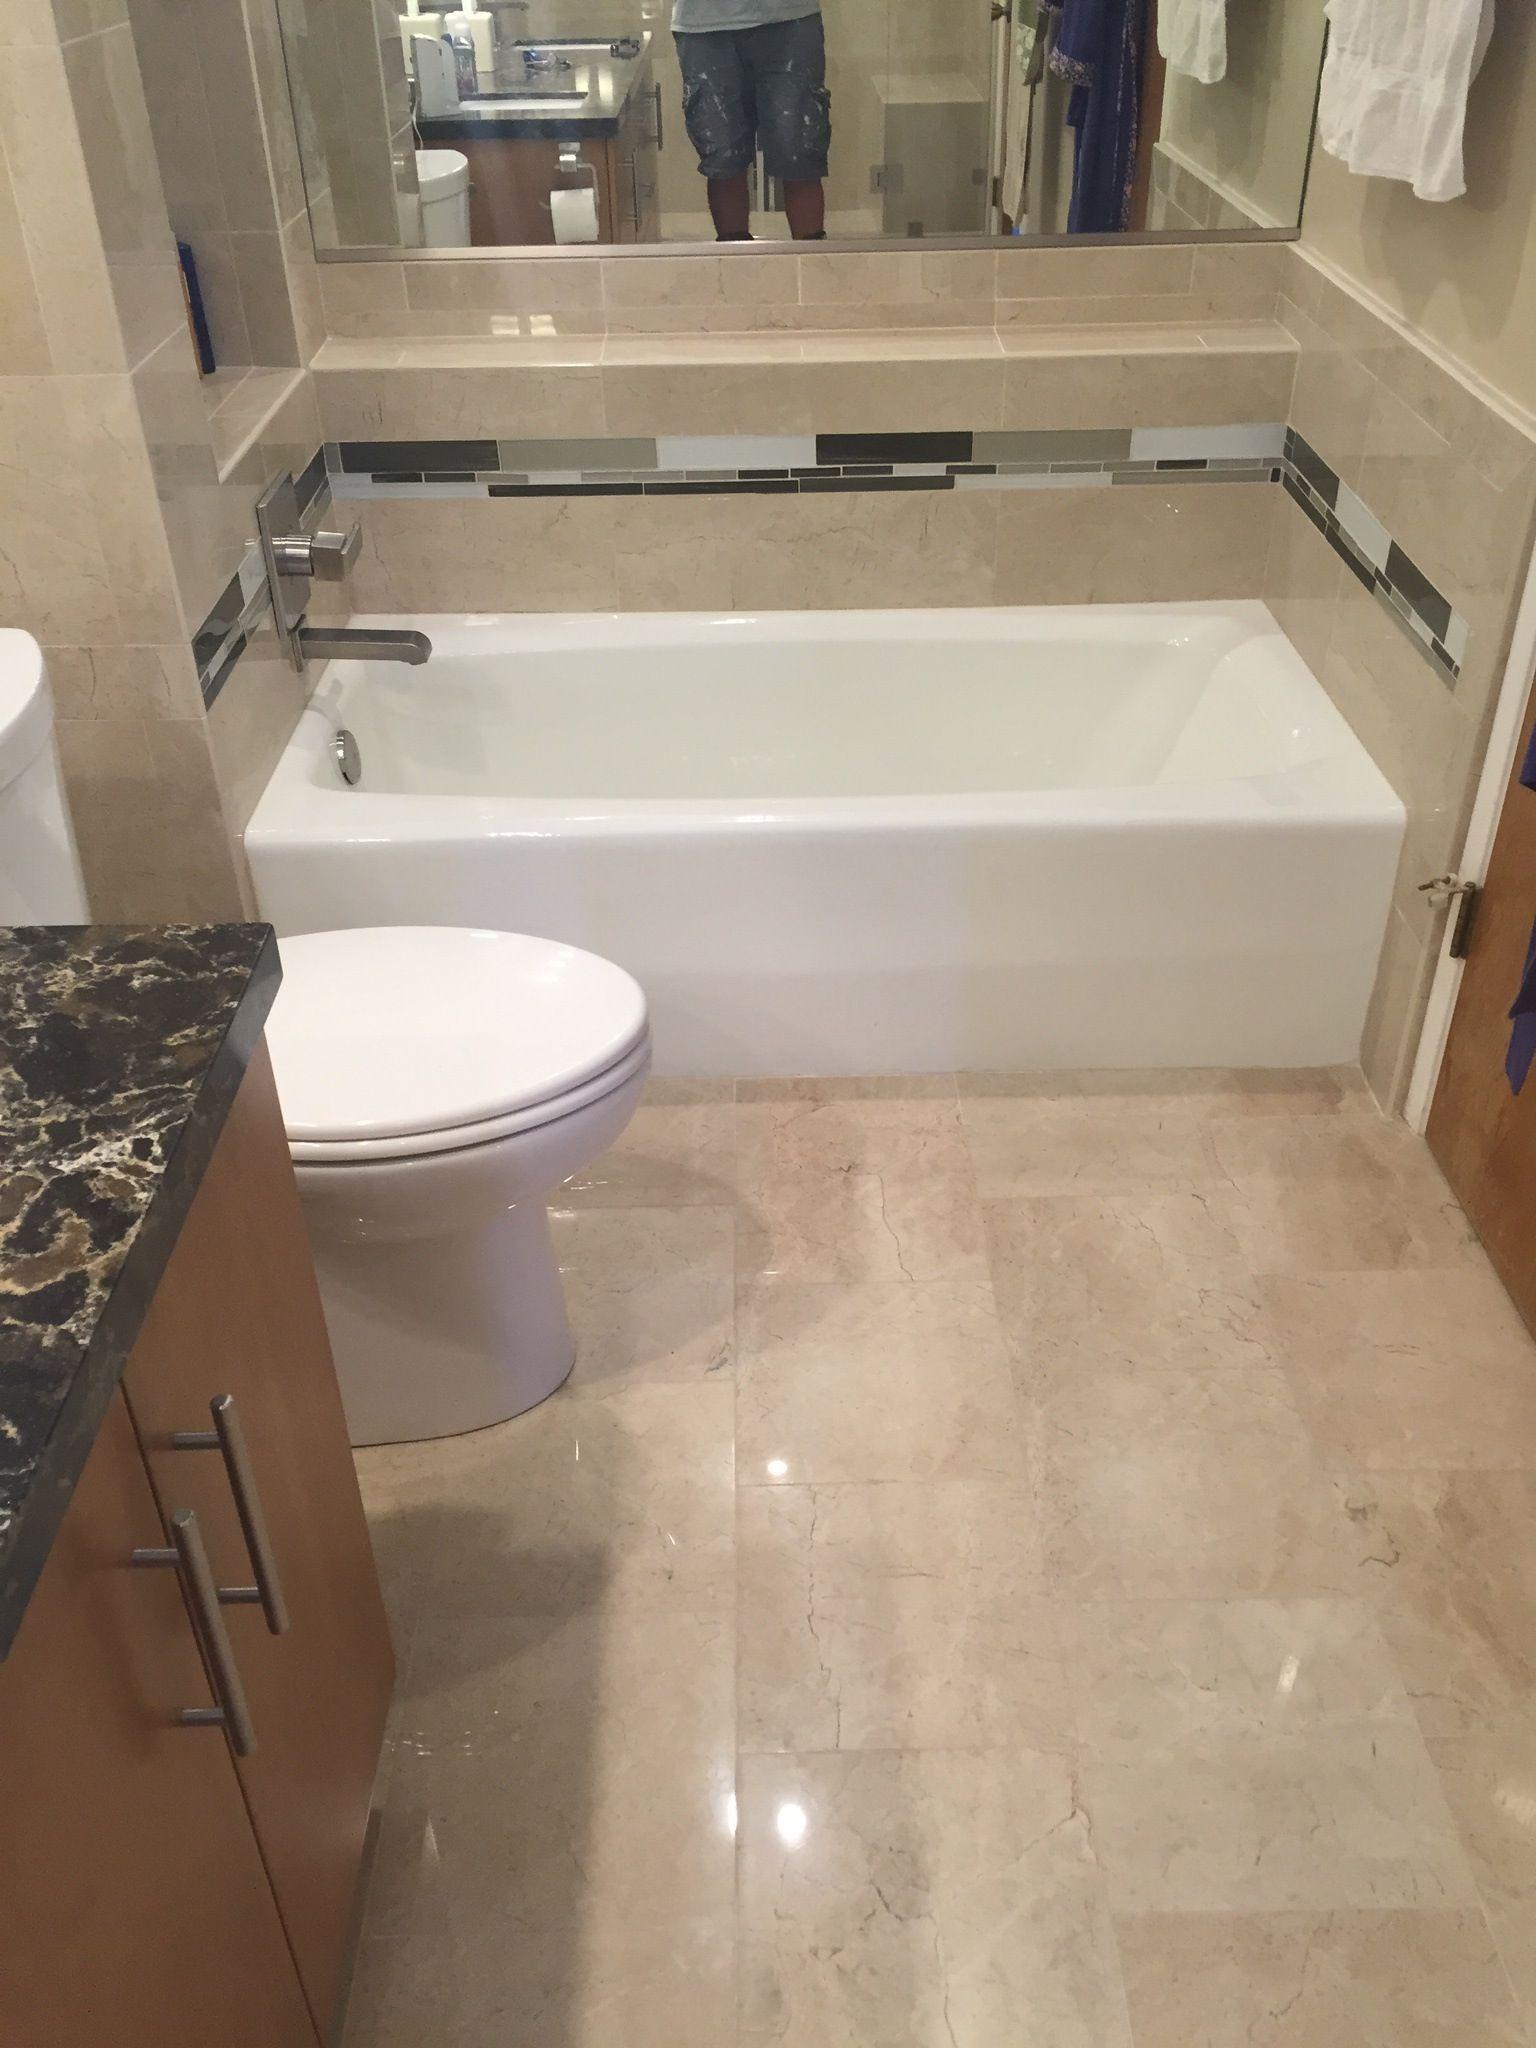 Crema Marfil Porcelain Tile Downstairs Bathroom Bathrooms Remodel Bathroom